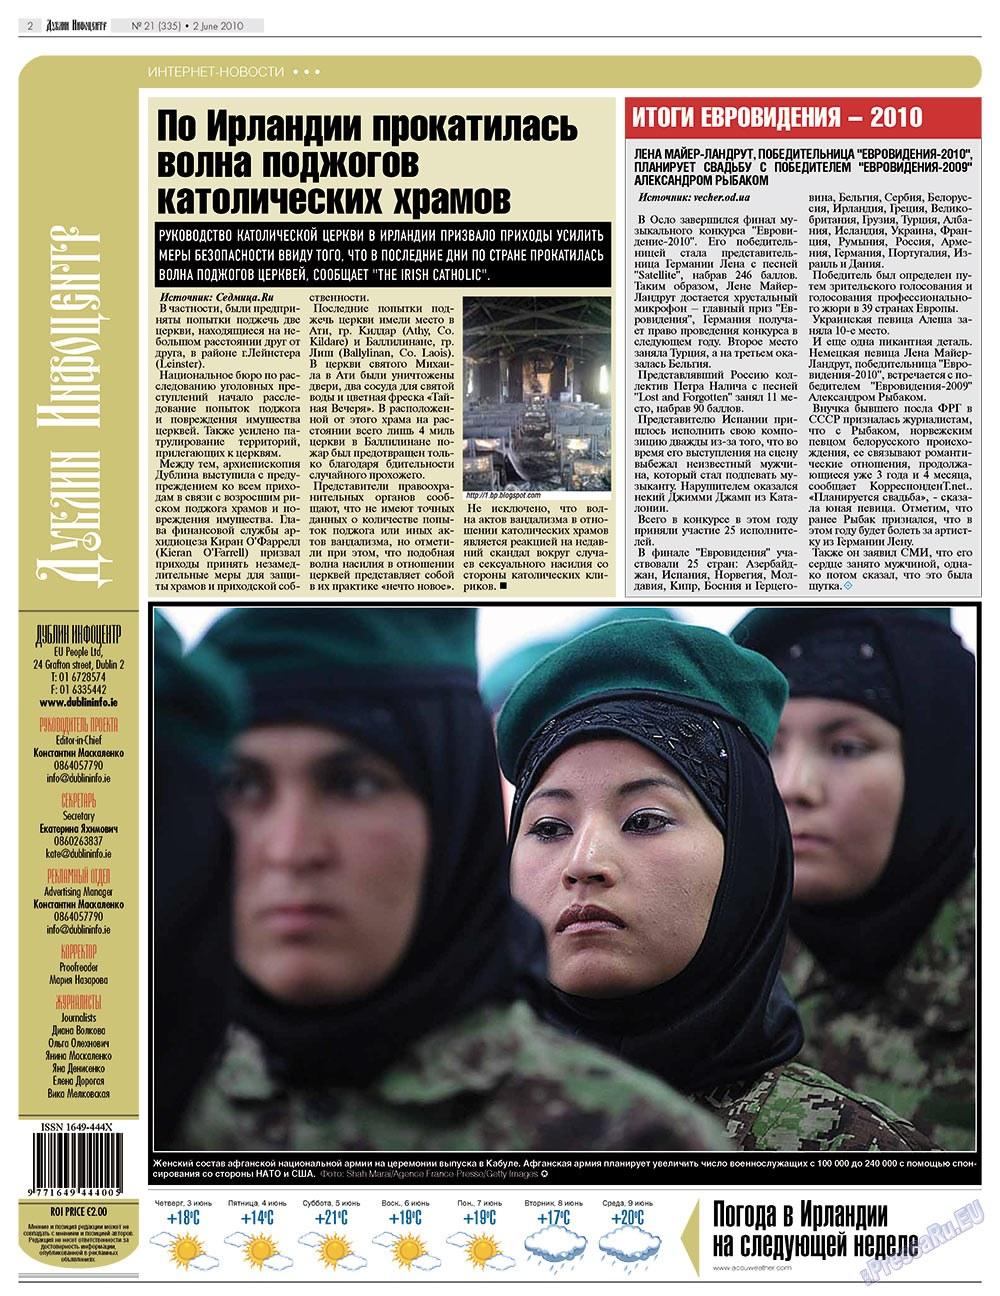 Дублин инфоцентр (газета). 2010 год, номер 21, стр. 2